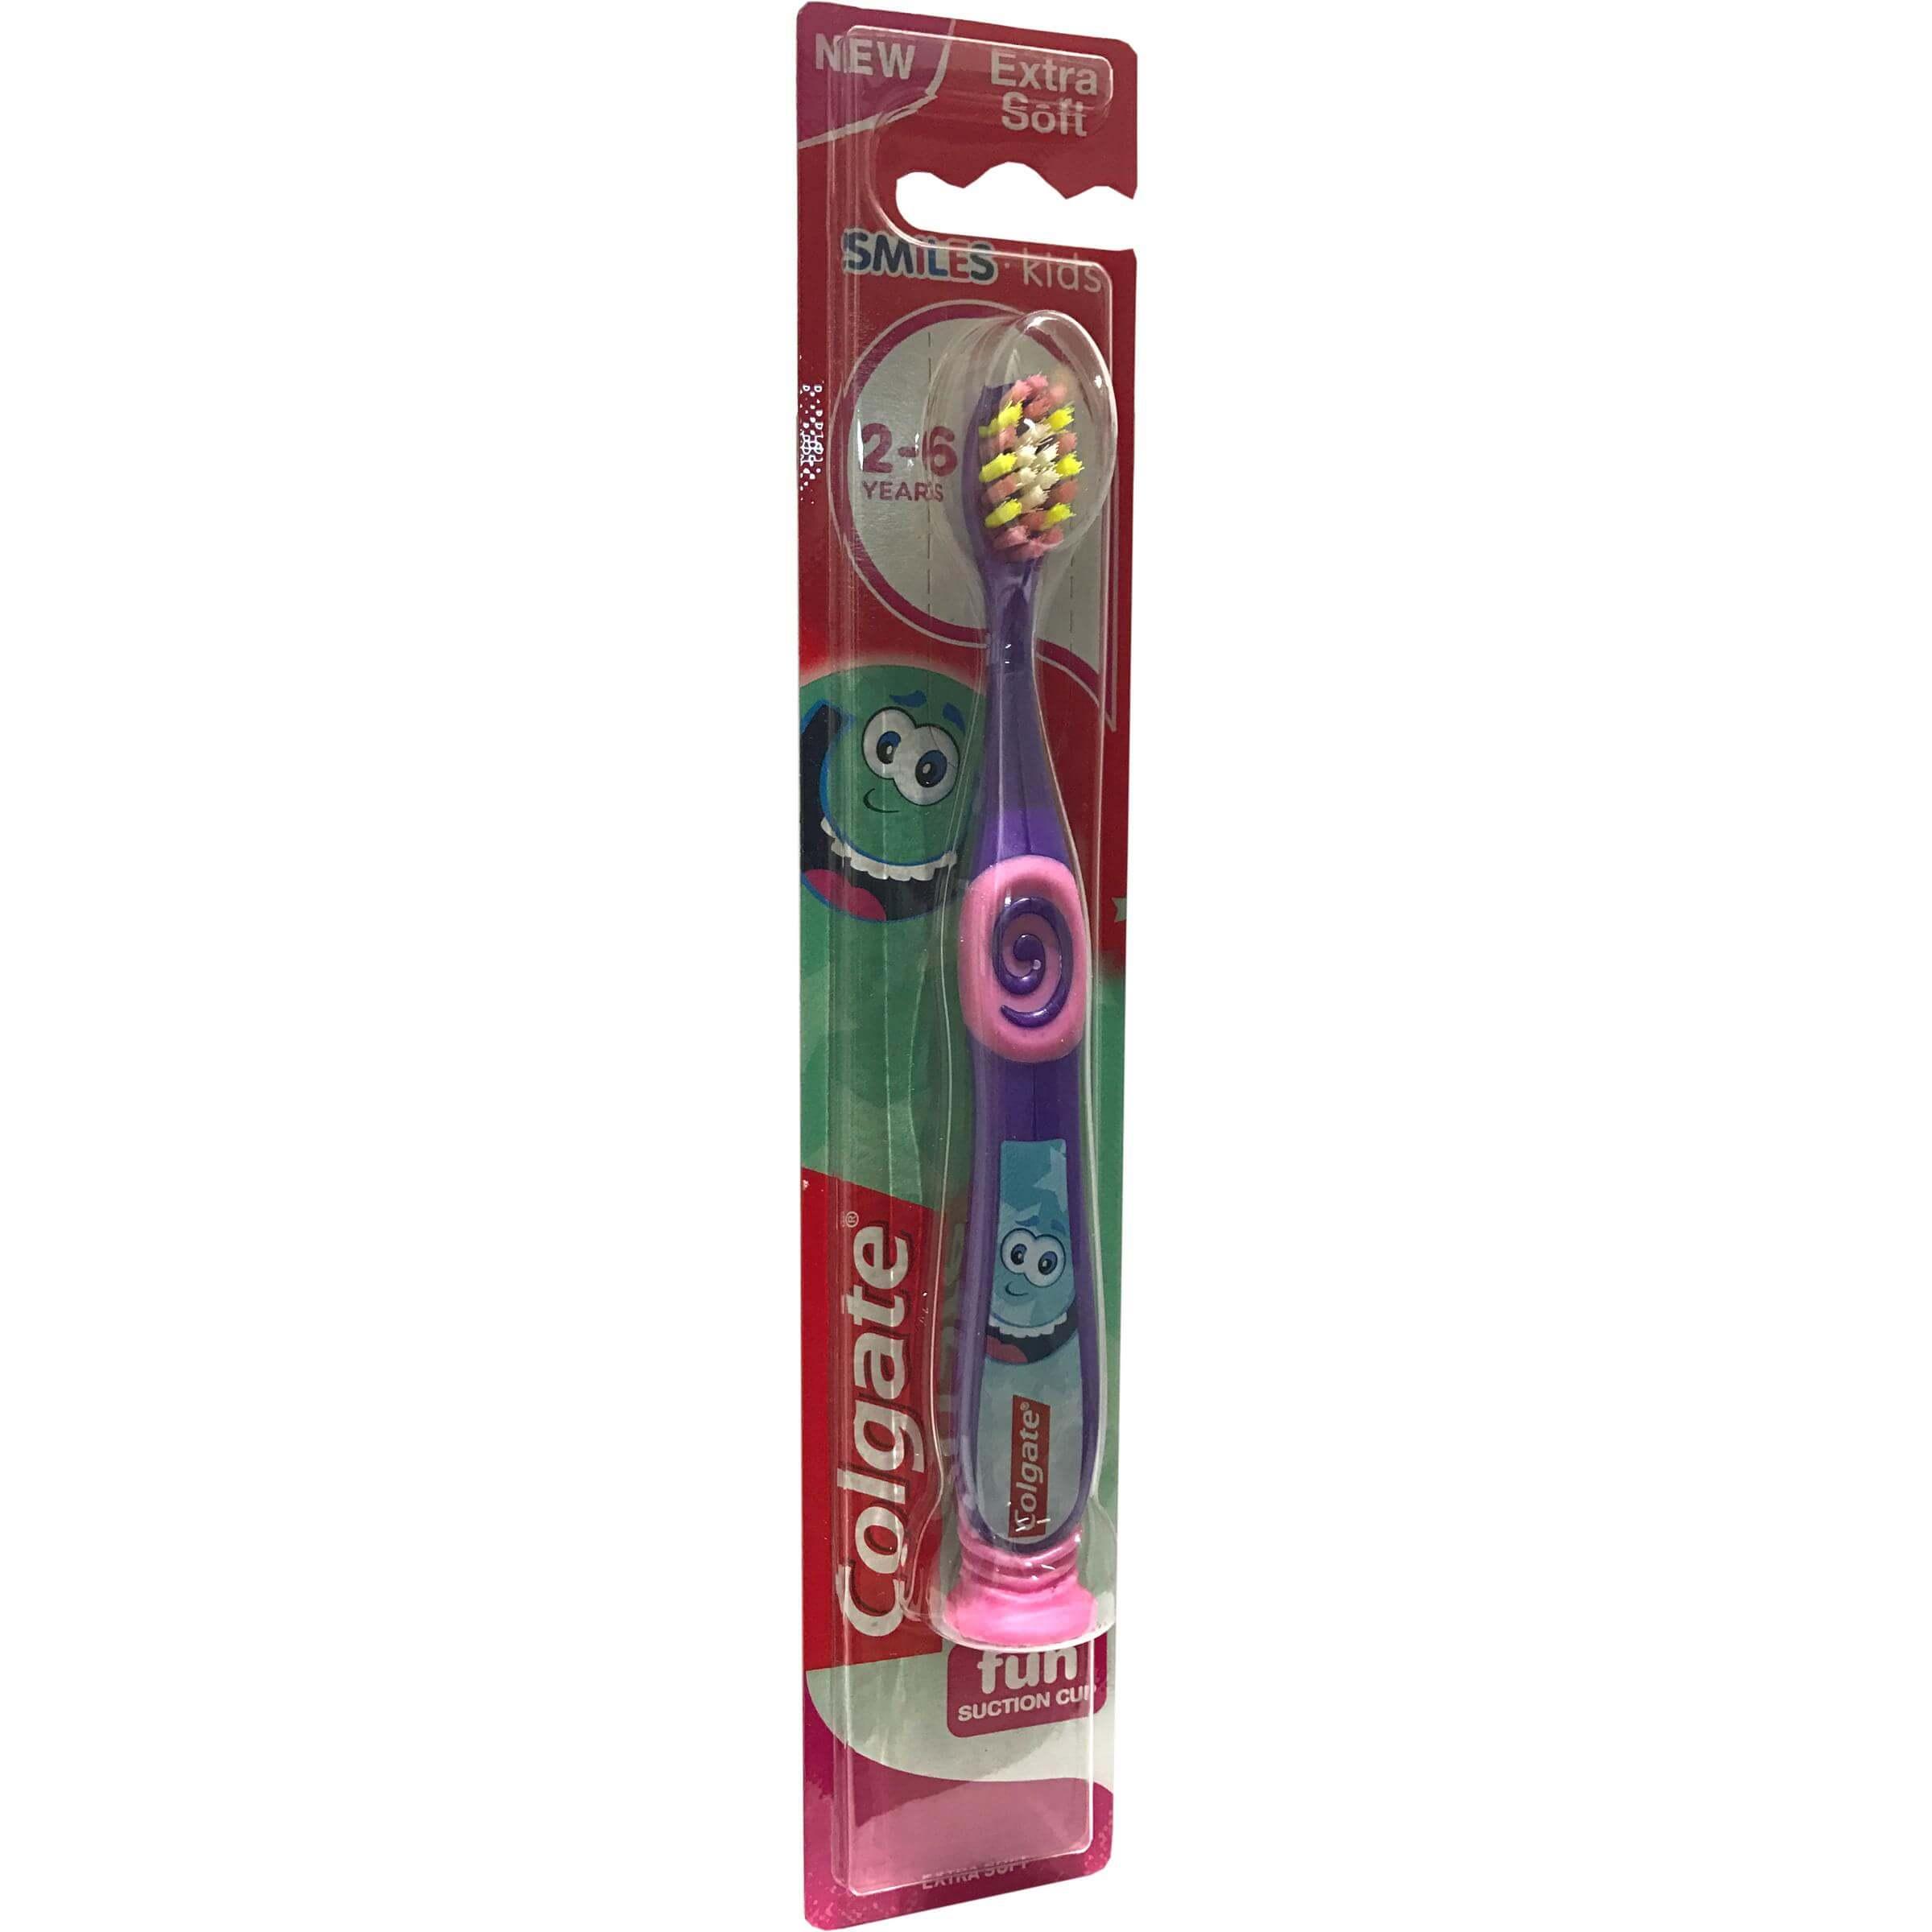 Colgate Kids Minios Extra Soft Οδοντόβουρτσα Παιδική 2-6 Χρονών σε Διαφορετικά Χρώματα με Ειδική Βάση 1τεμάχιο – κίτρινο